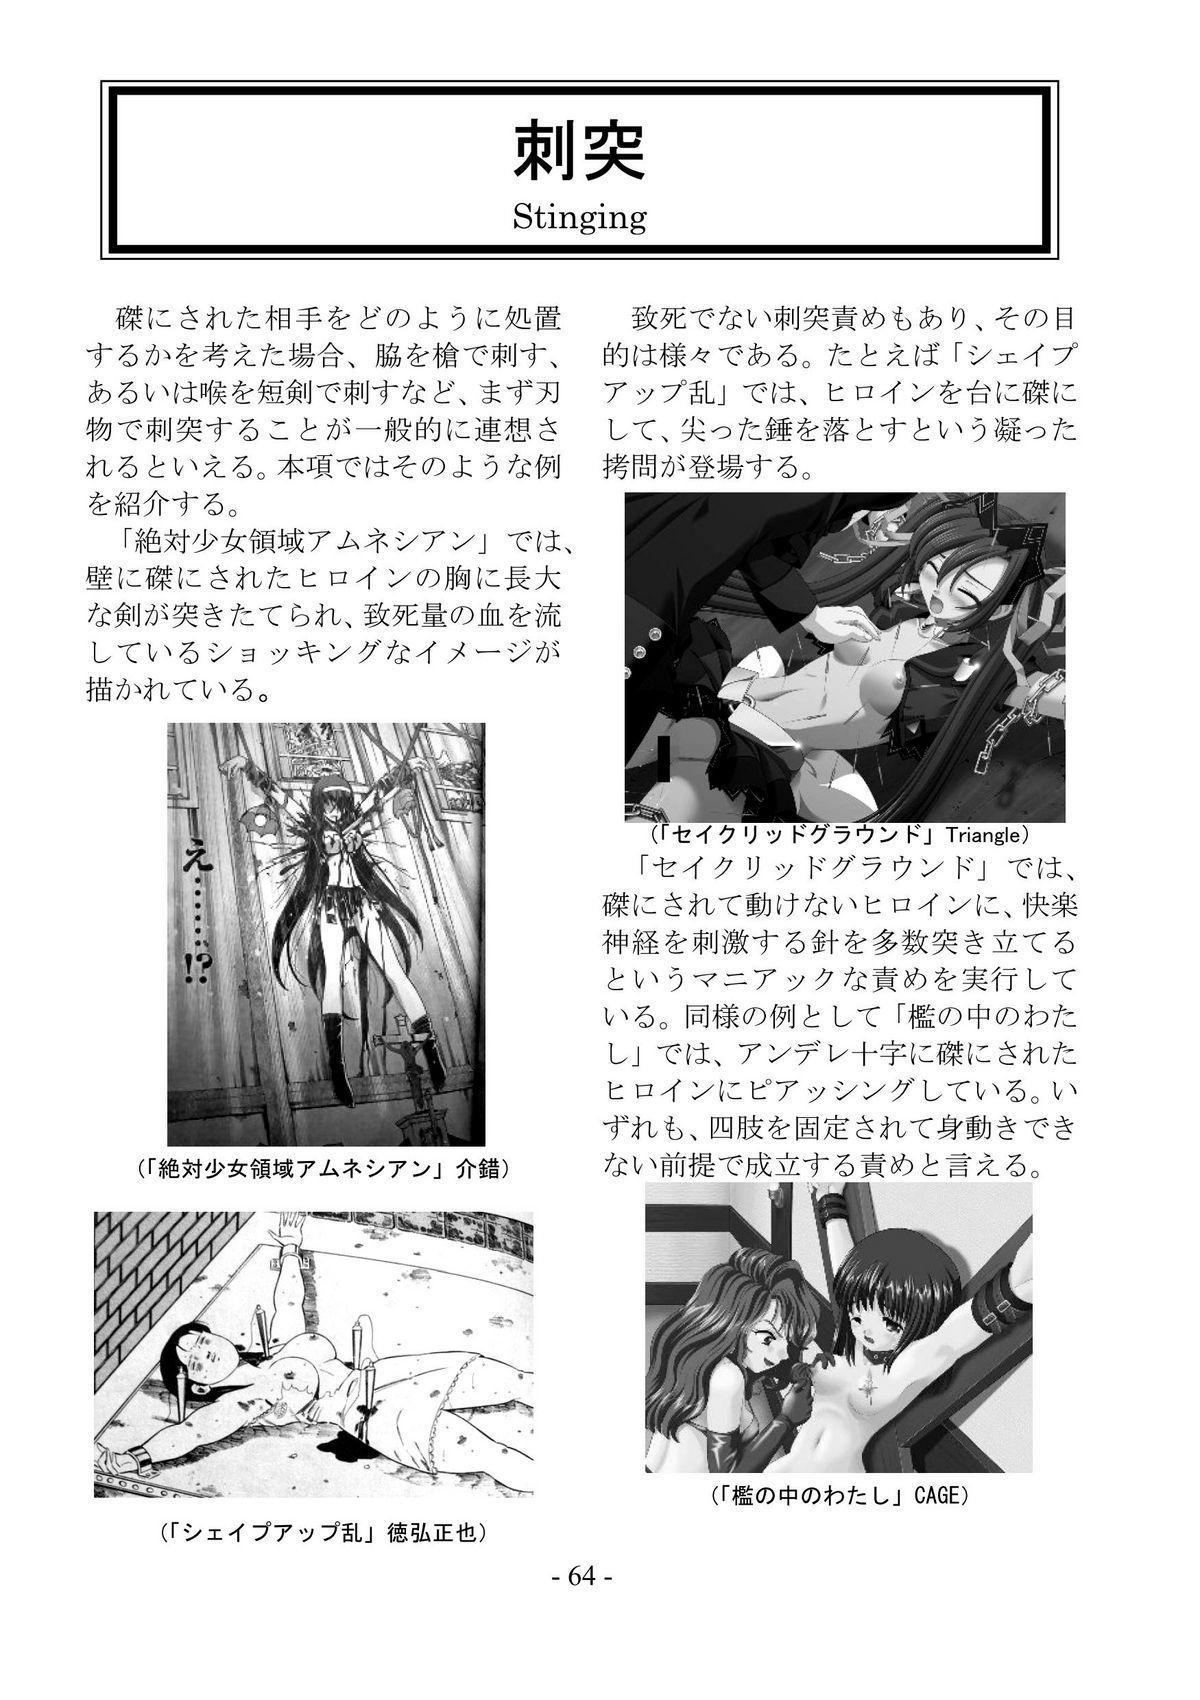 encyclopedia of crucifixion 64